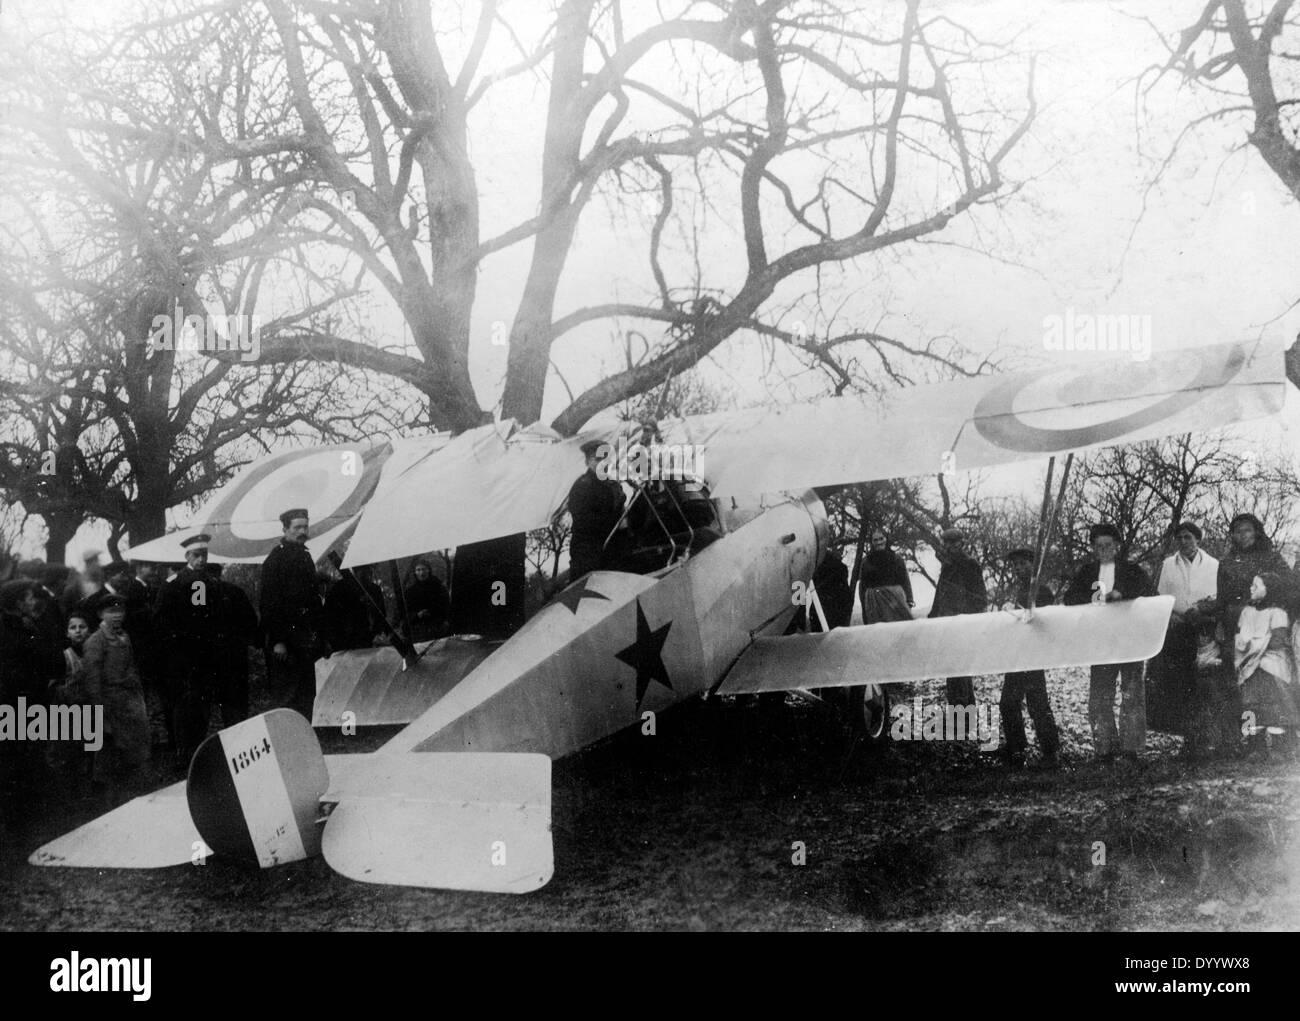 Emergency landing in World War I - Stock Image